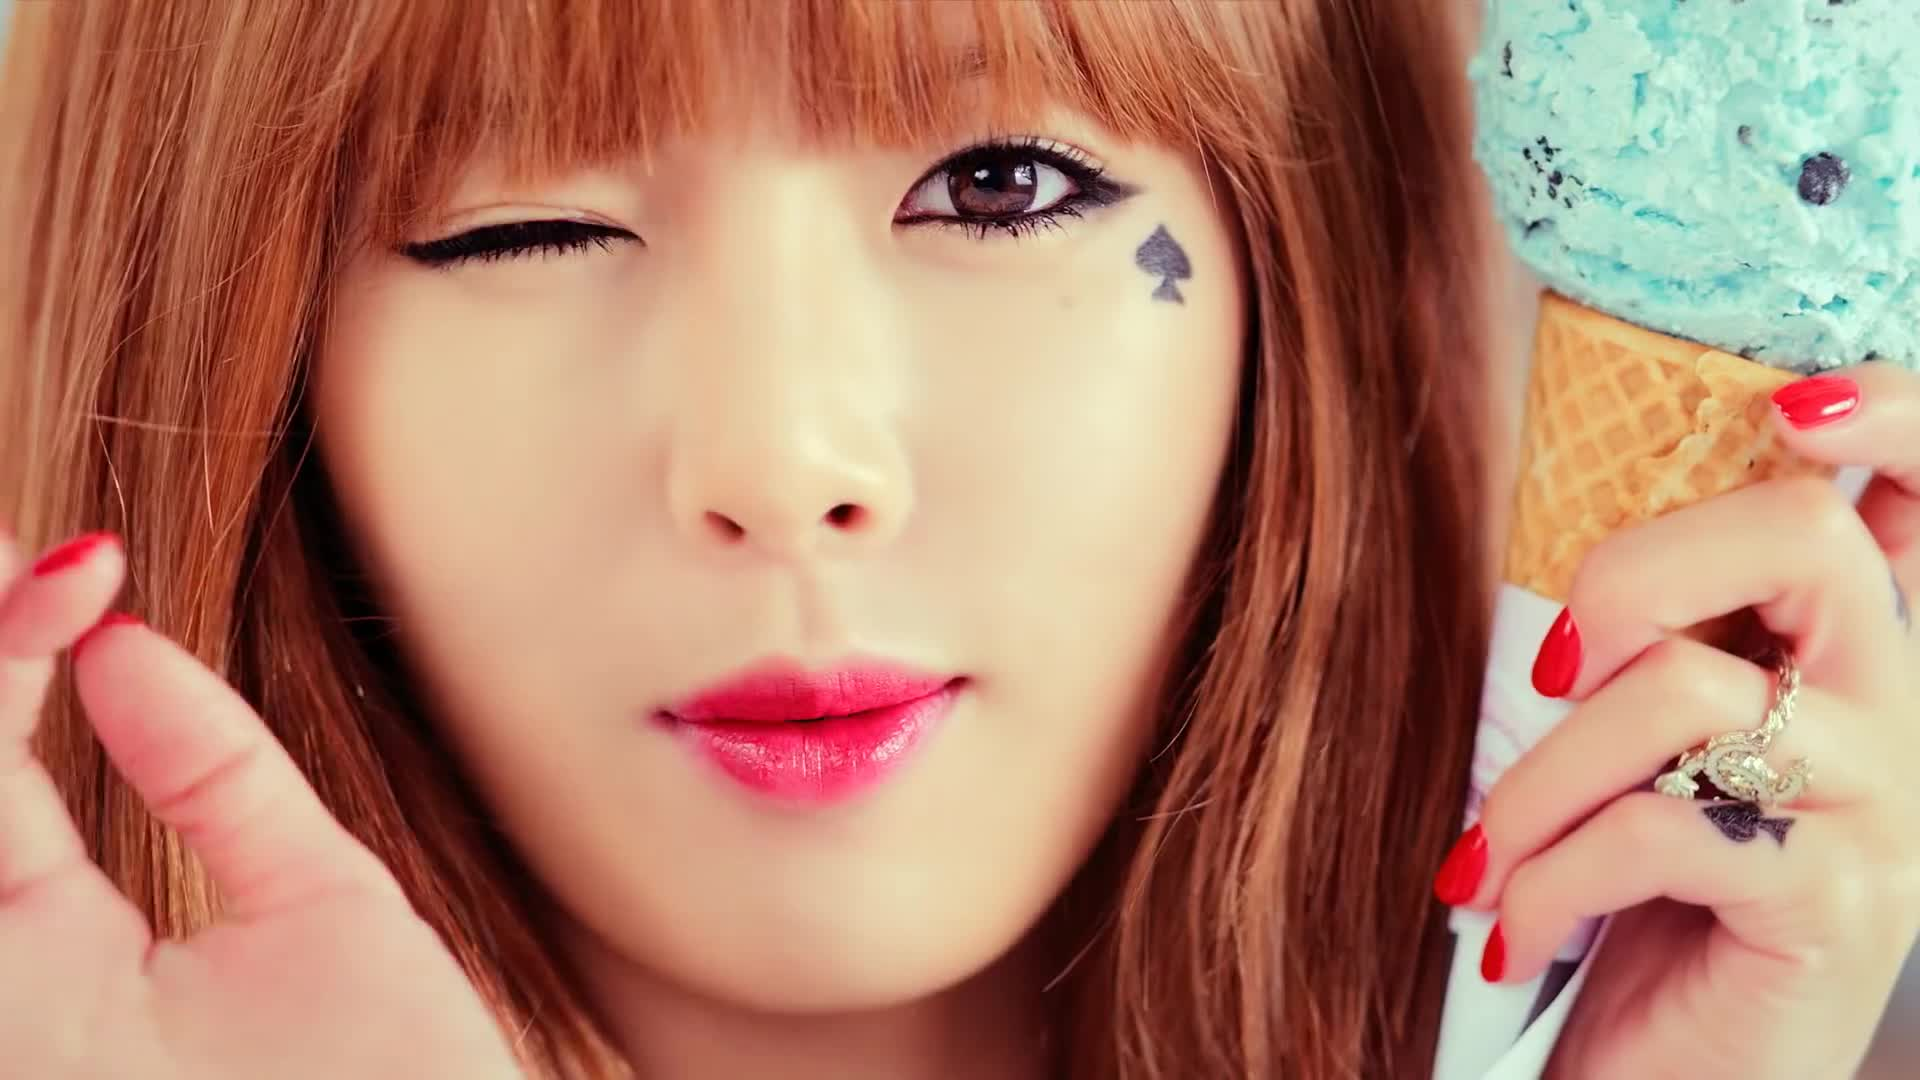 cube, cube entertainment, hyuna, kpop, 큐브, 큐브 엔터테인먼트, HYUNA - 'Ice Cream' (Official Music Video) GIFs